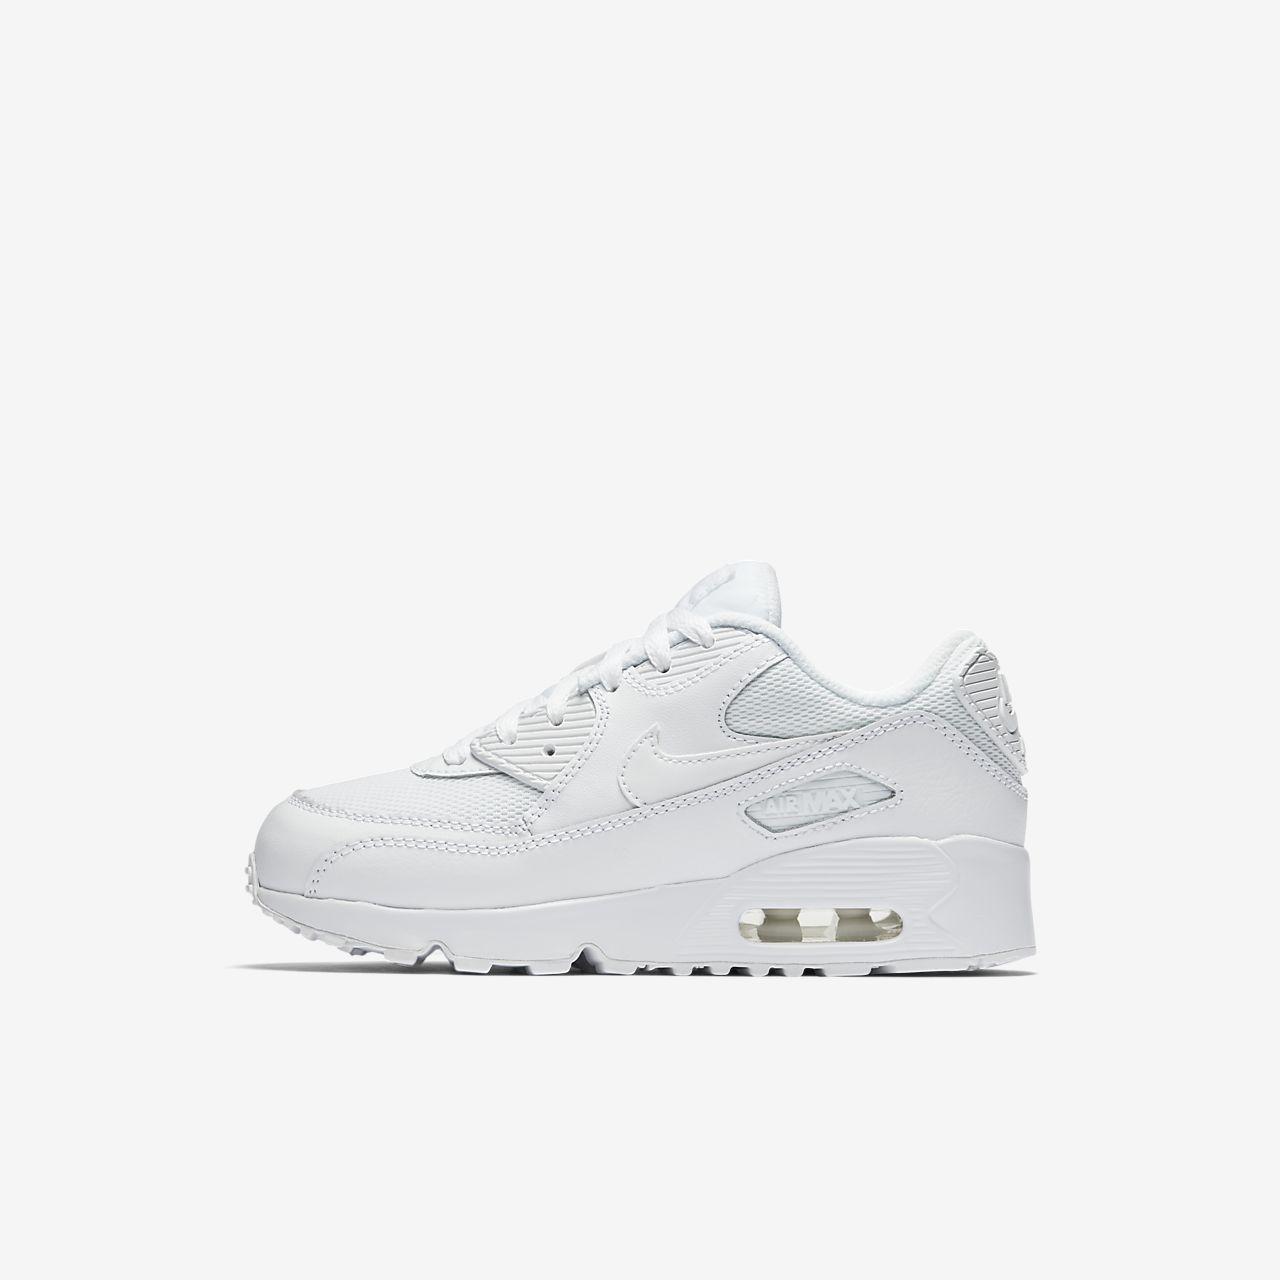 81f51d6882c ... hot sko nike air max 90 mesh för barn storlek 27535 c356e 2ff30